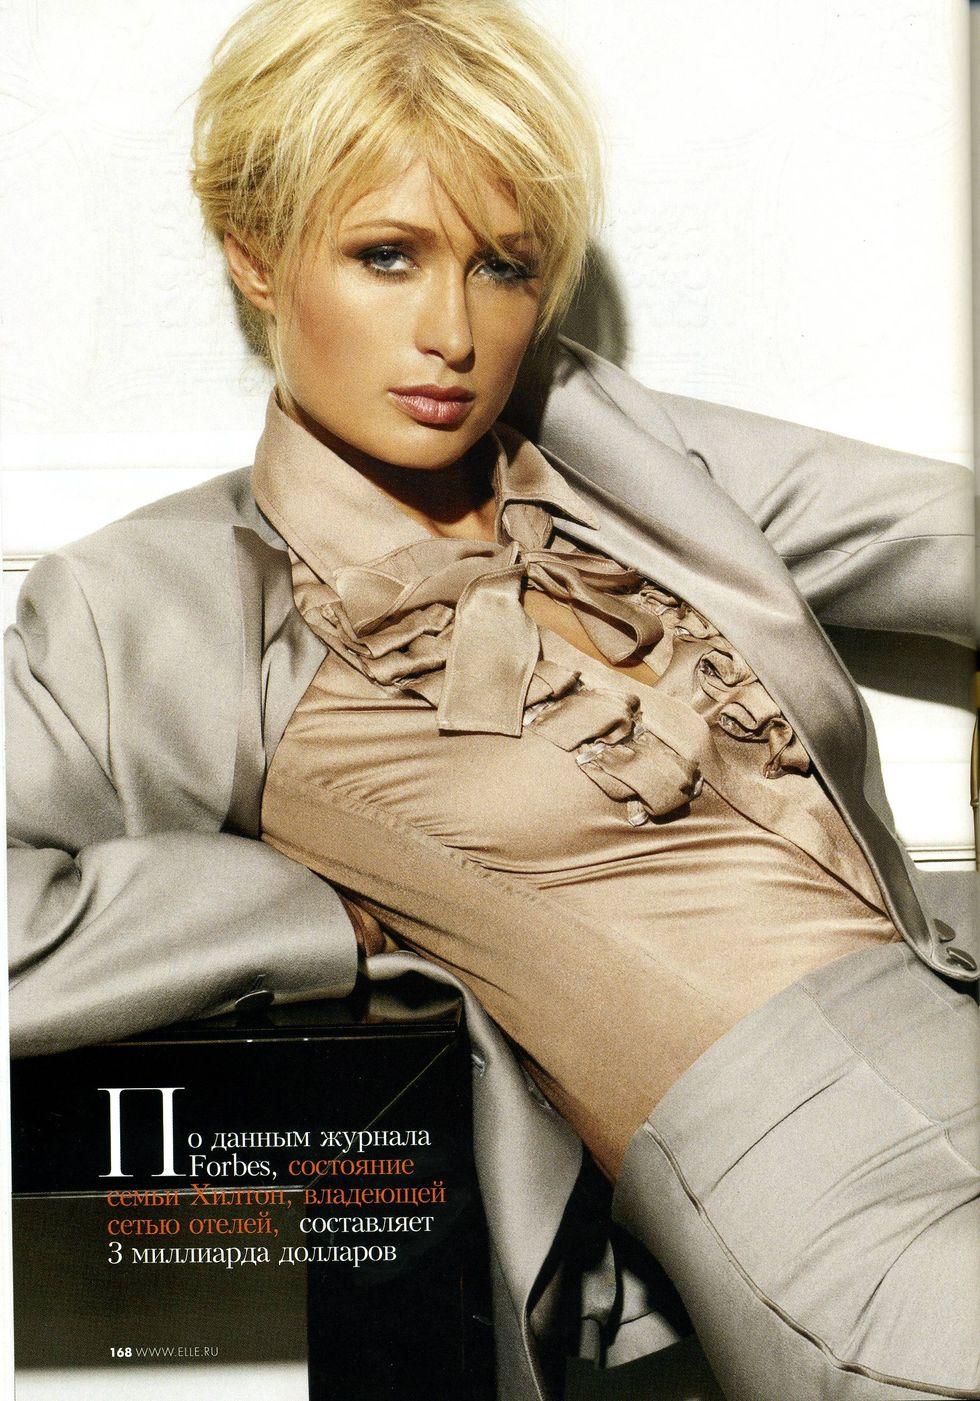 paris-hilton-elle-magazine-russia-november-2007-01